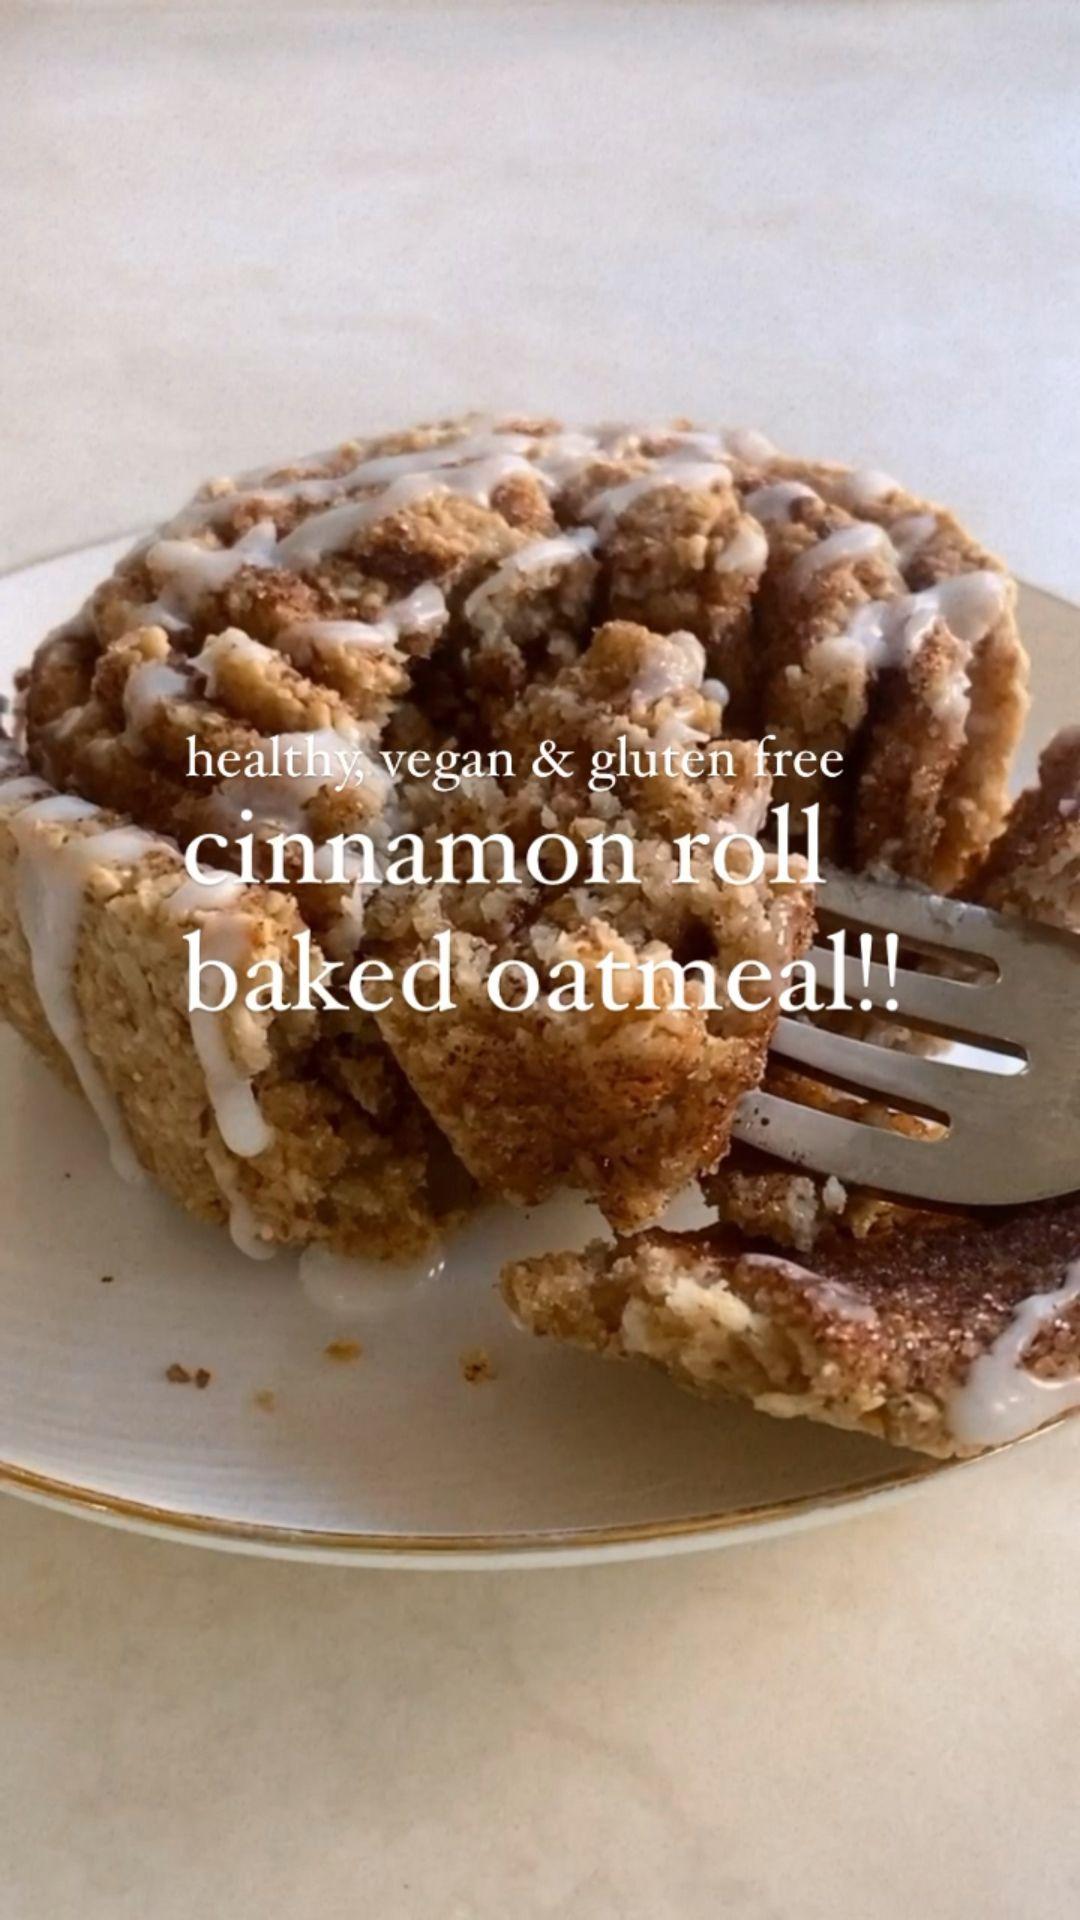 🤍cinnamon roll baked oatmeal!! (healthy, vegan, gl